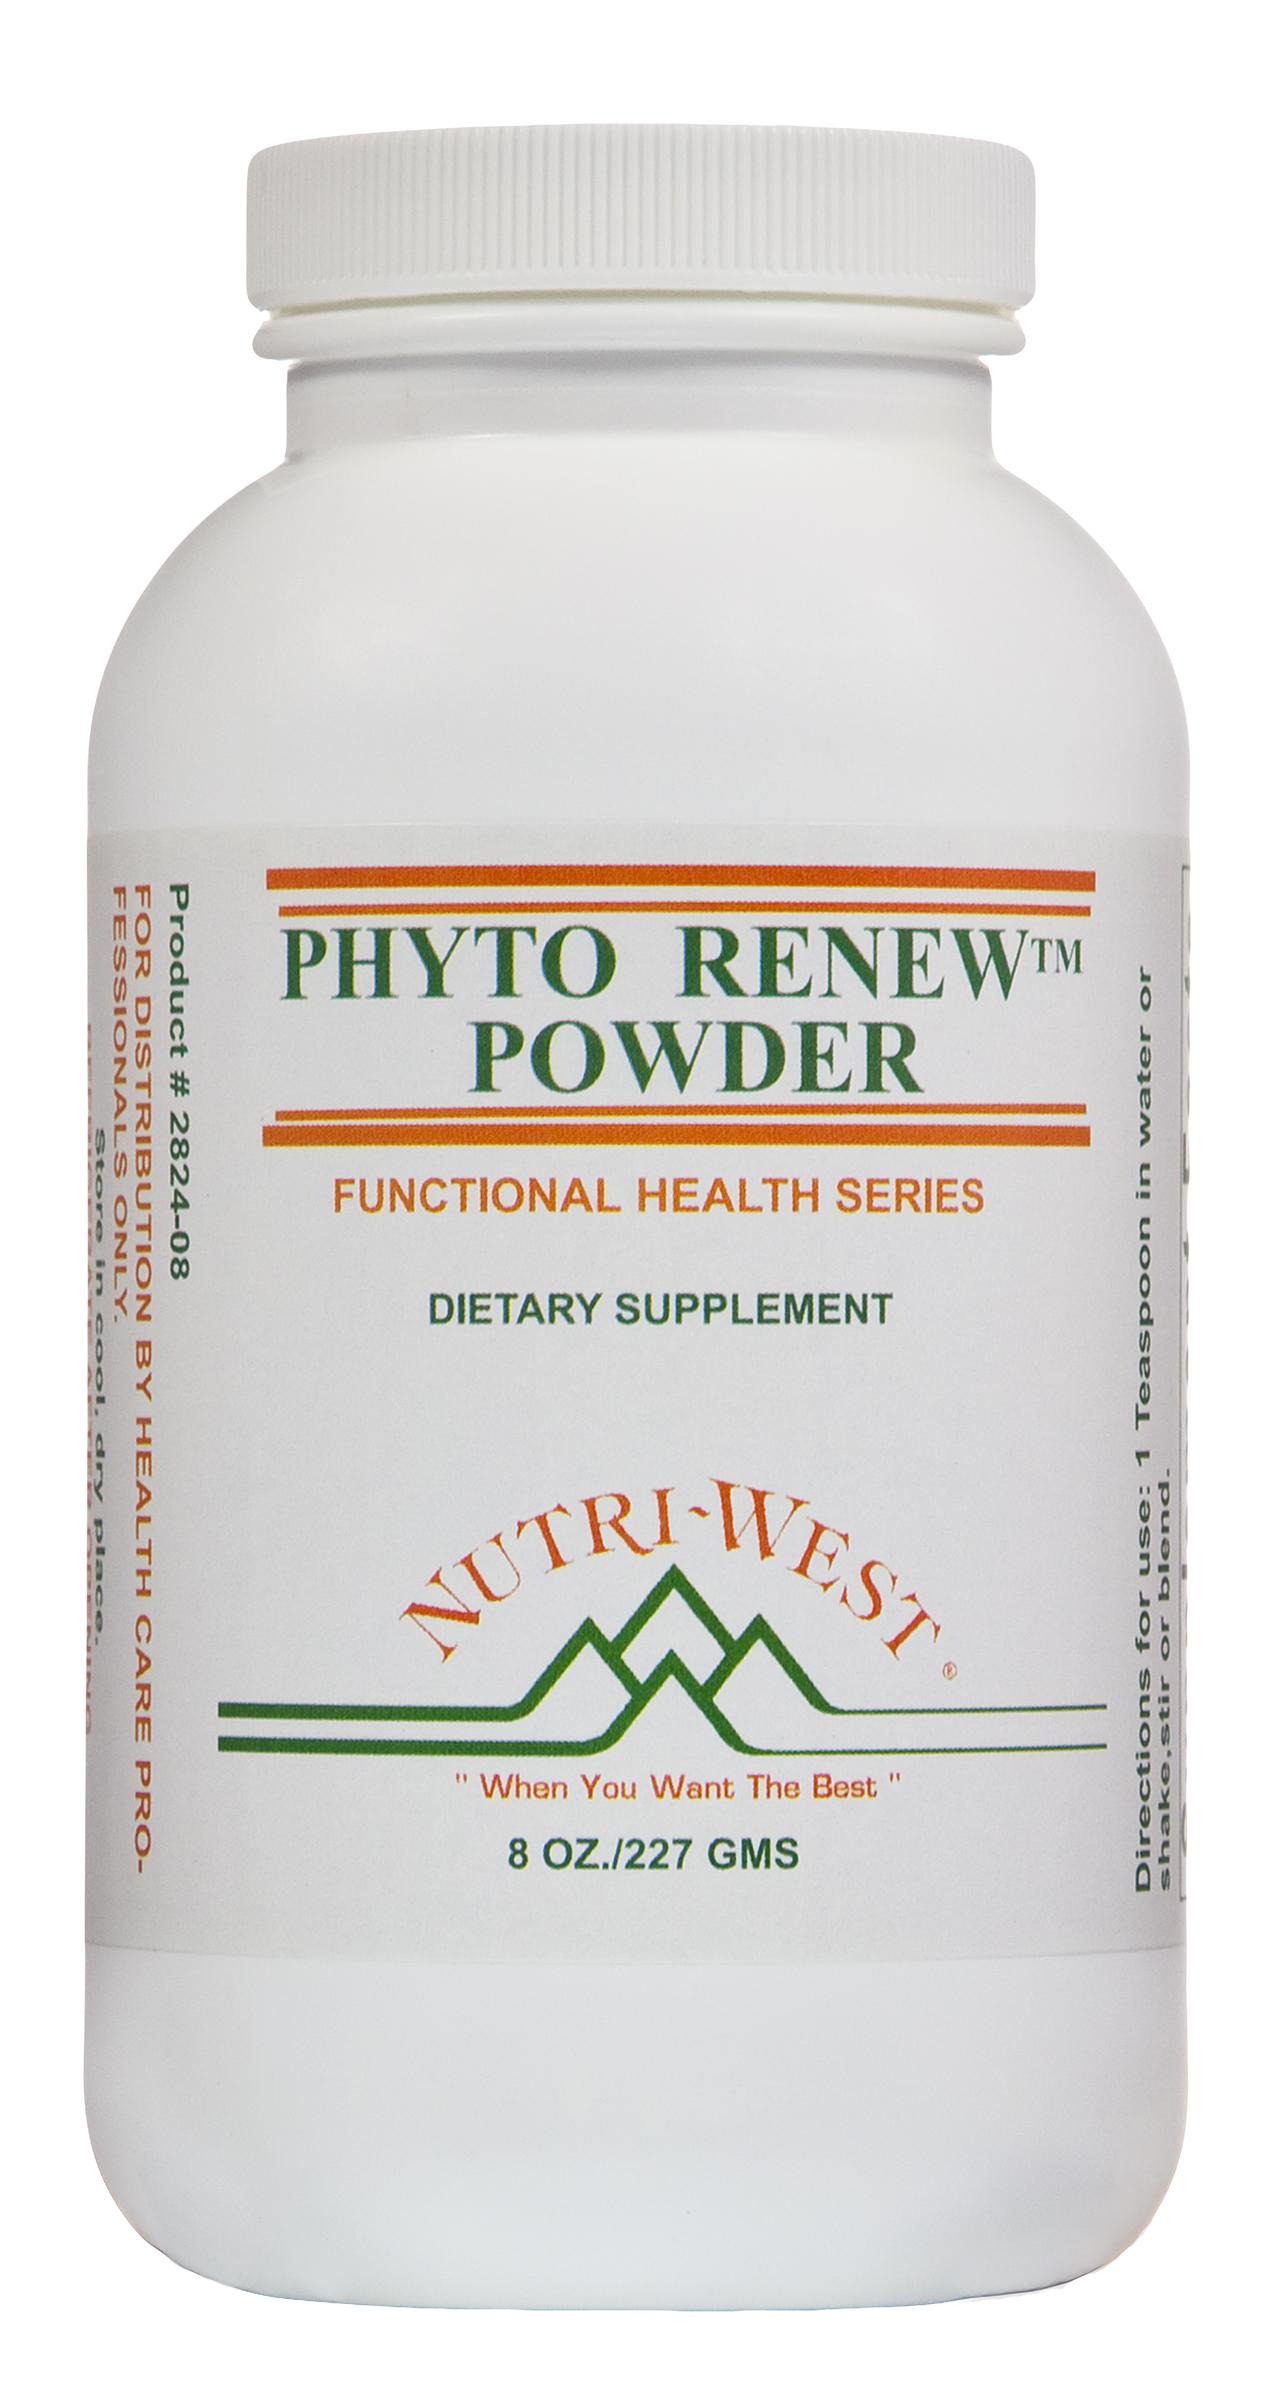 Phyto Renew Powder 8oz